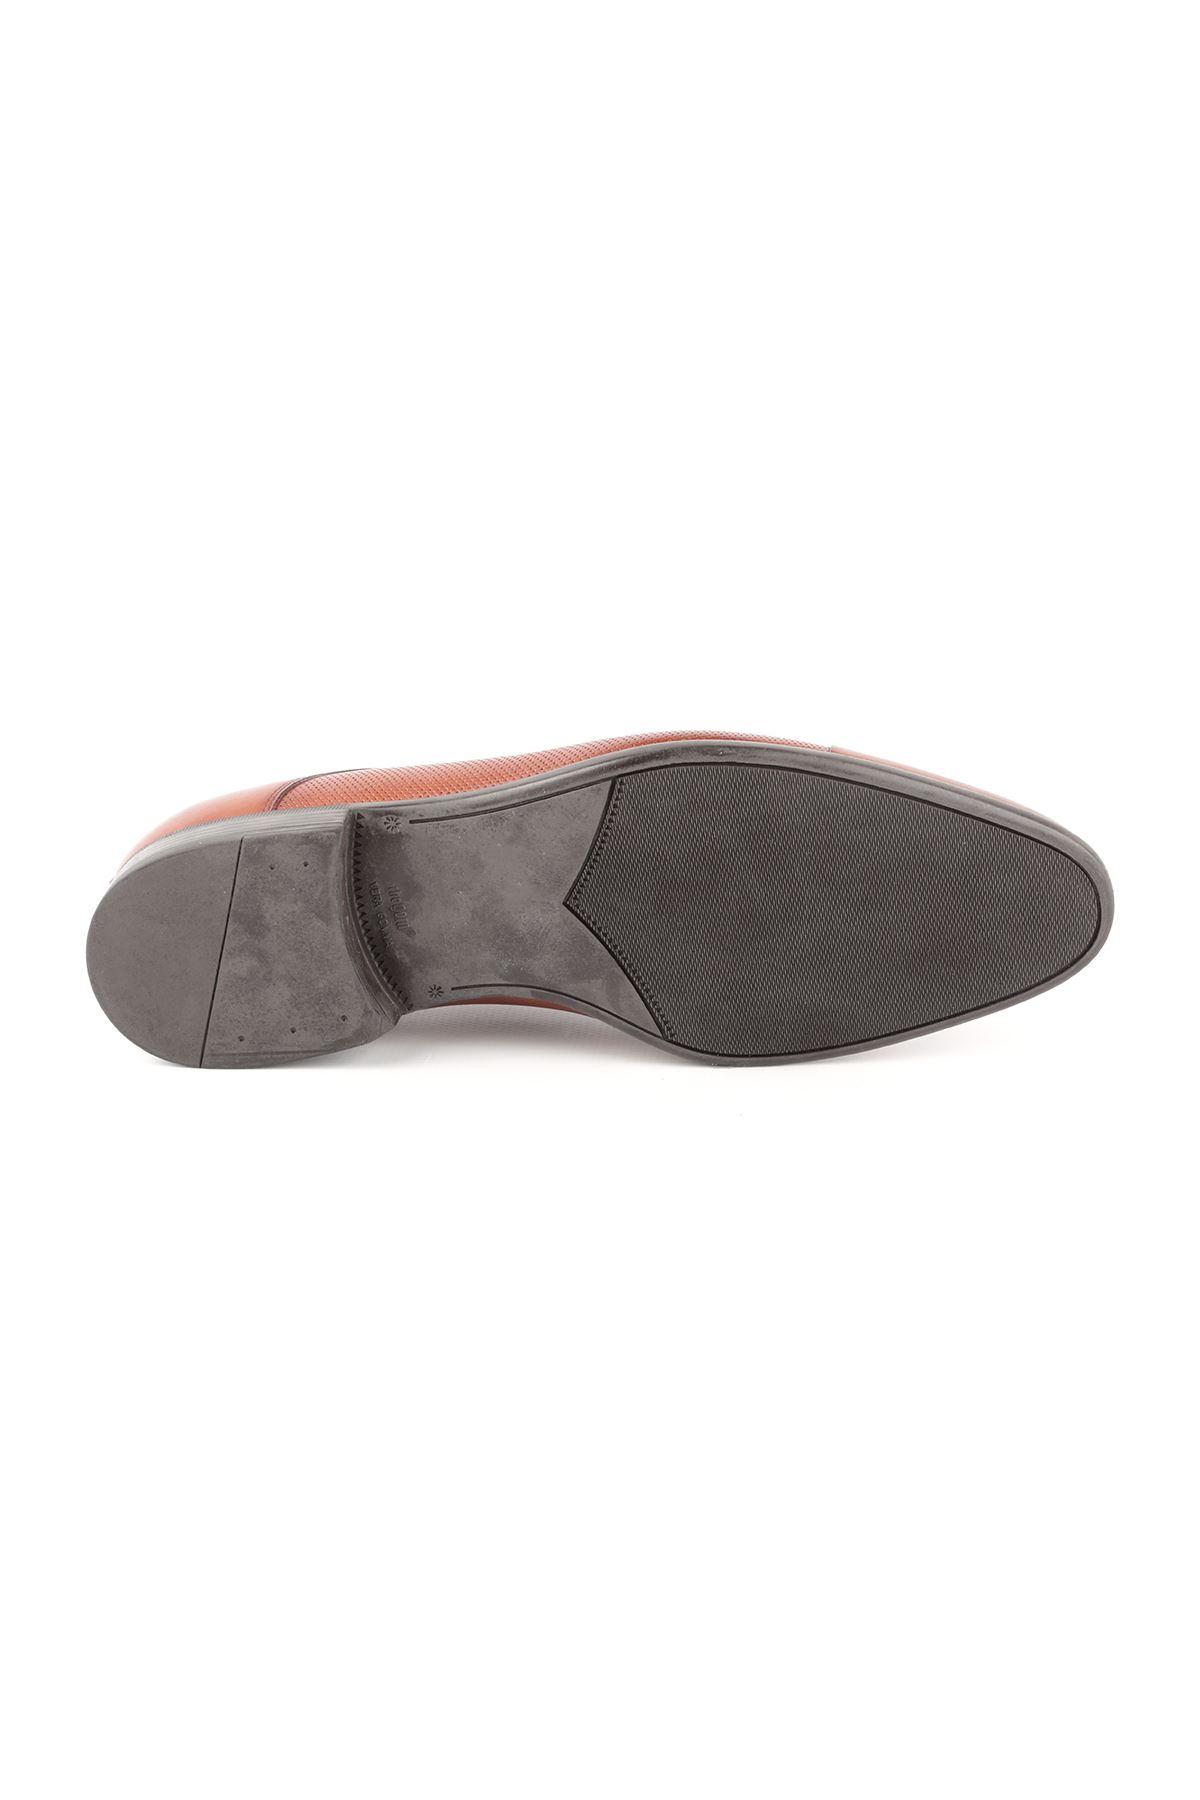 Libero T1415 Tan Classic Shoes